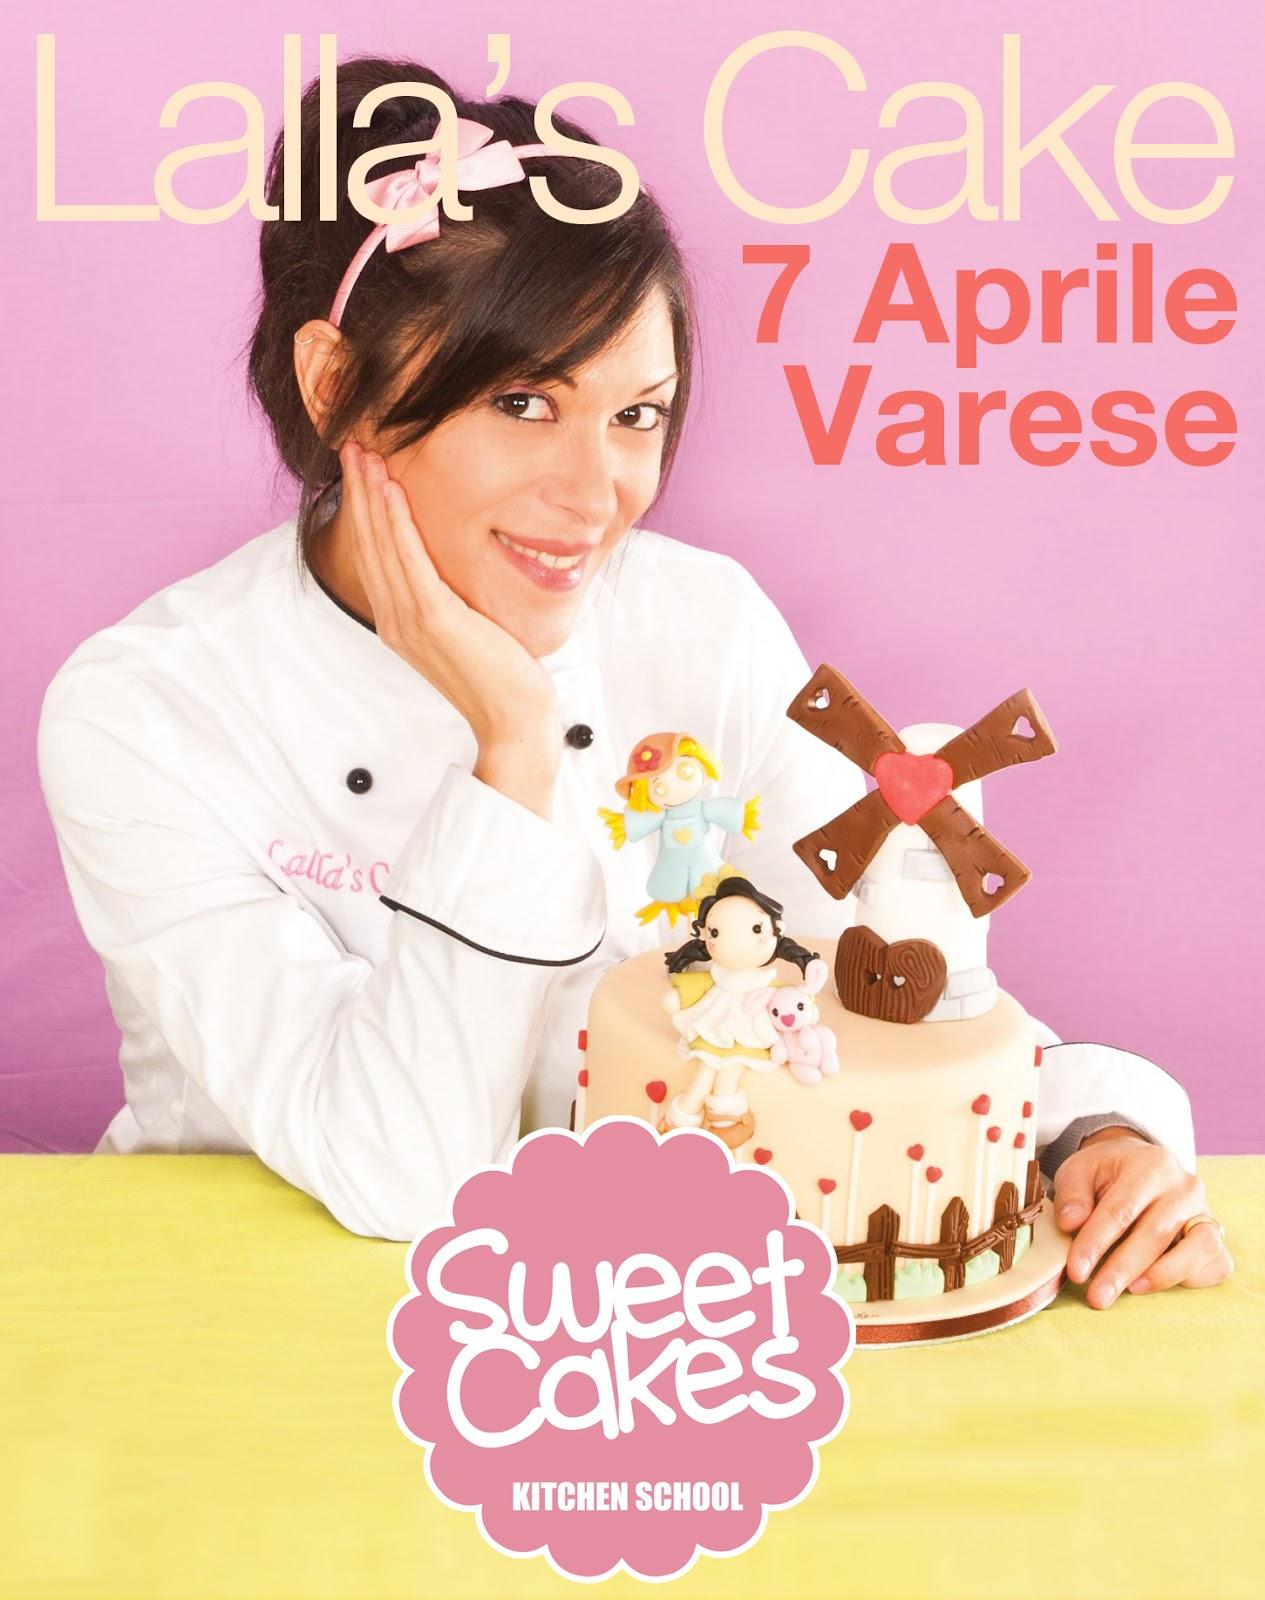 Corso di cake design VARESE, 7 aprile 2013 - Sweet Cakes ...